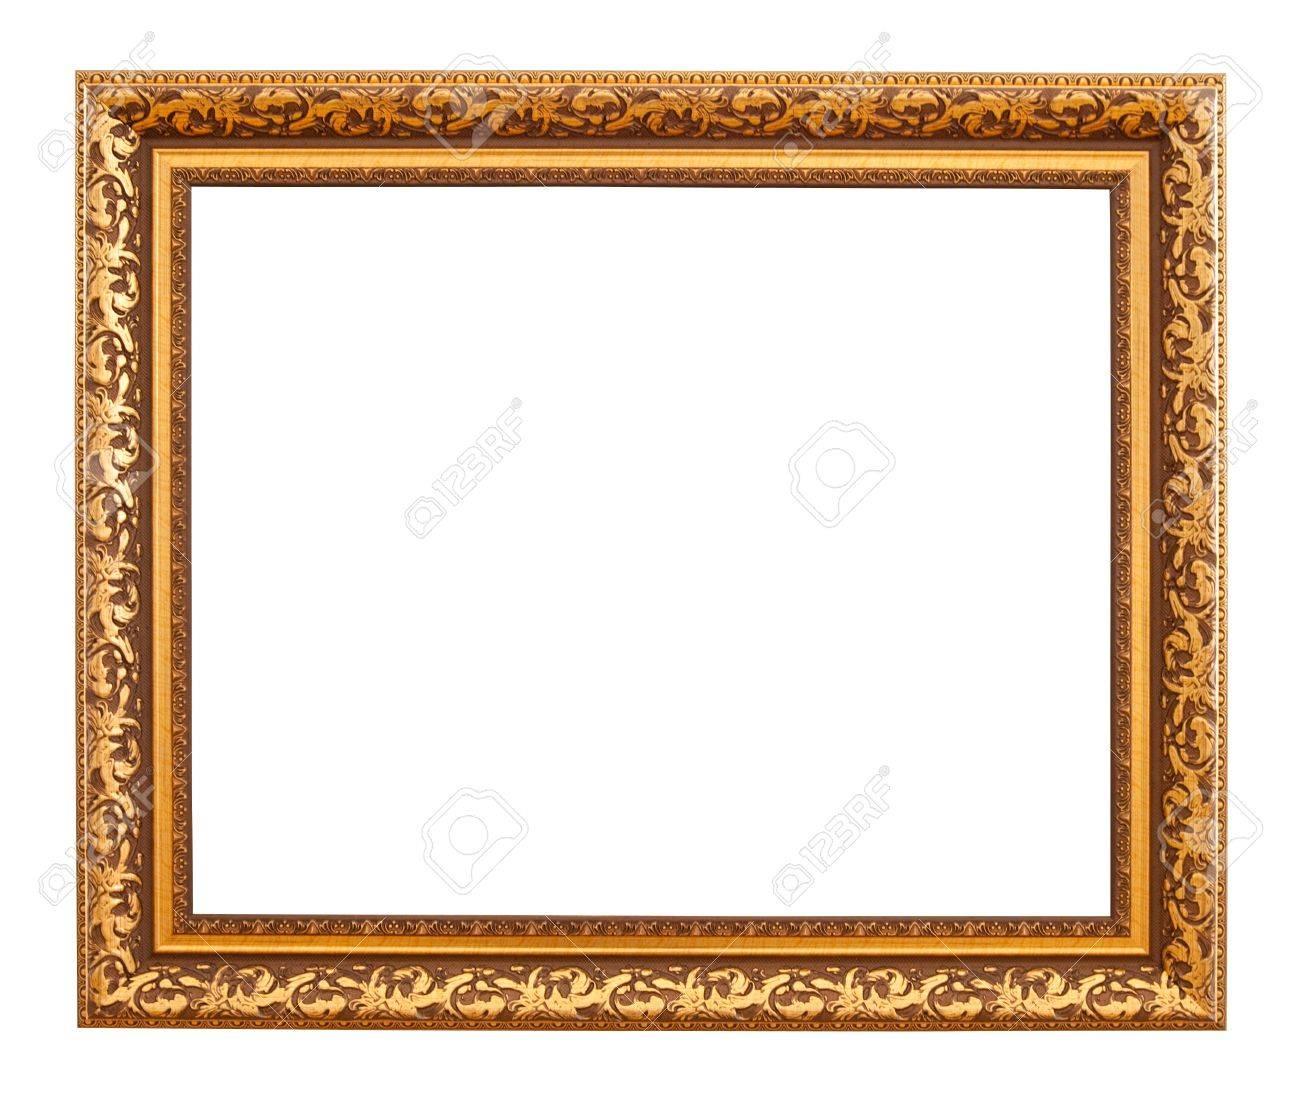 Luxury gold frame. Isolated over white background Stock Photo - 9061430